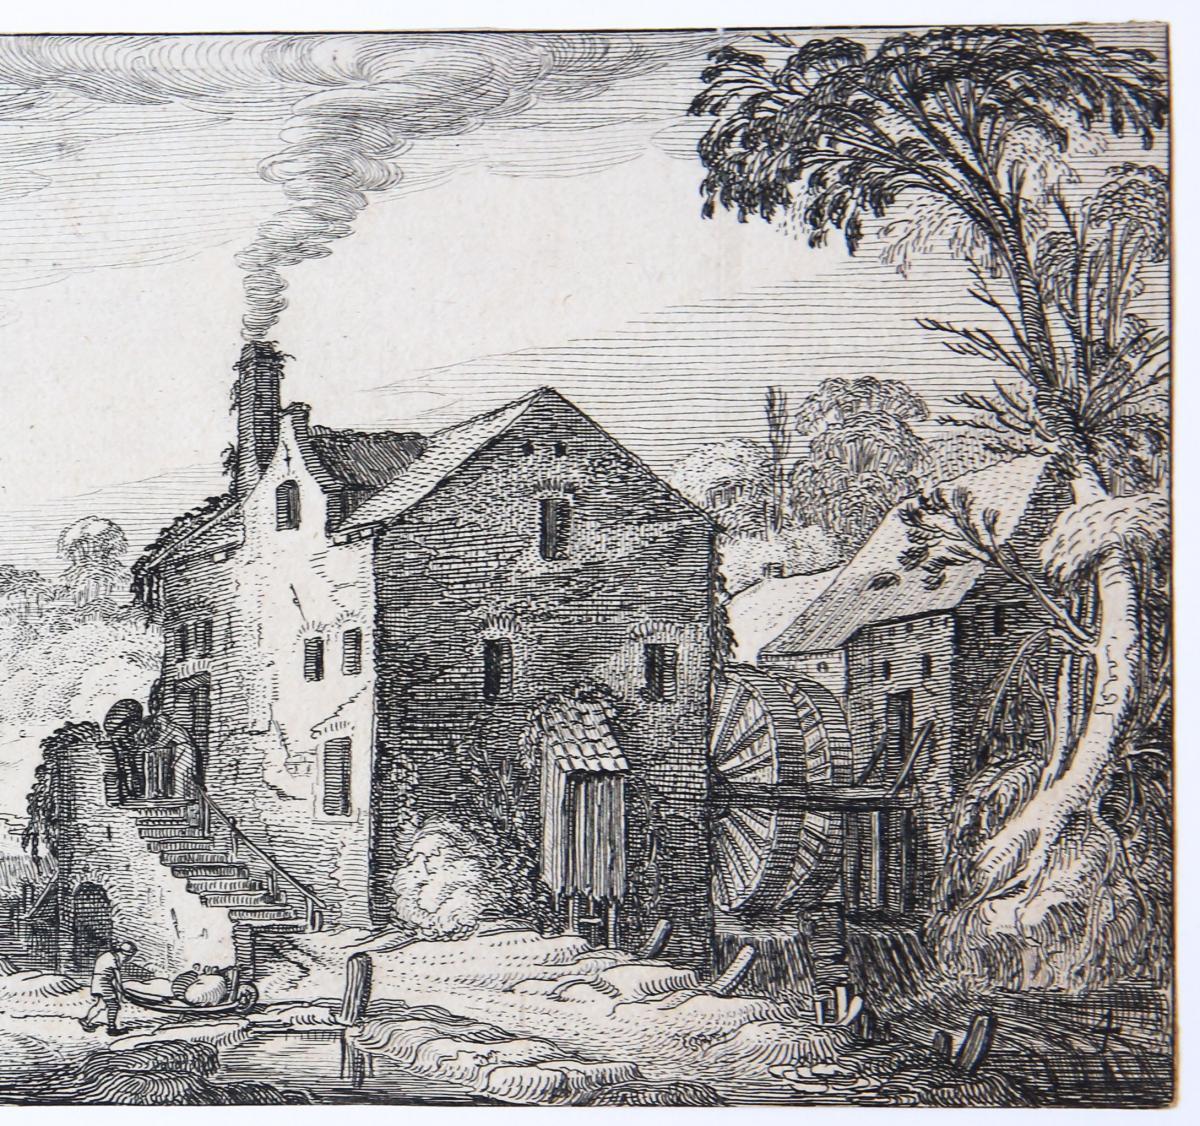 Water-mill near a village [Set title: Landscapes and ruins]/Watermolen bij een dorp.